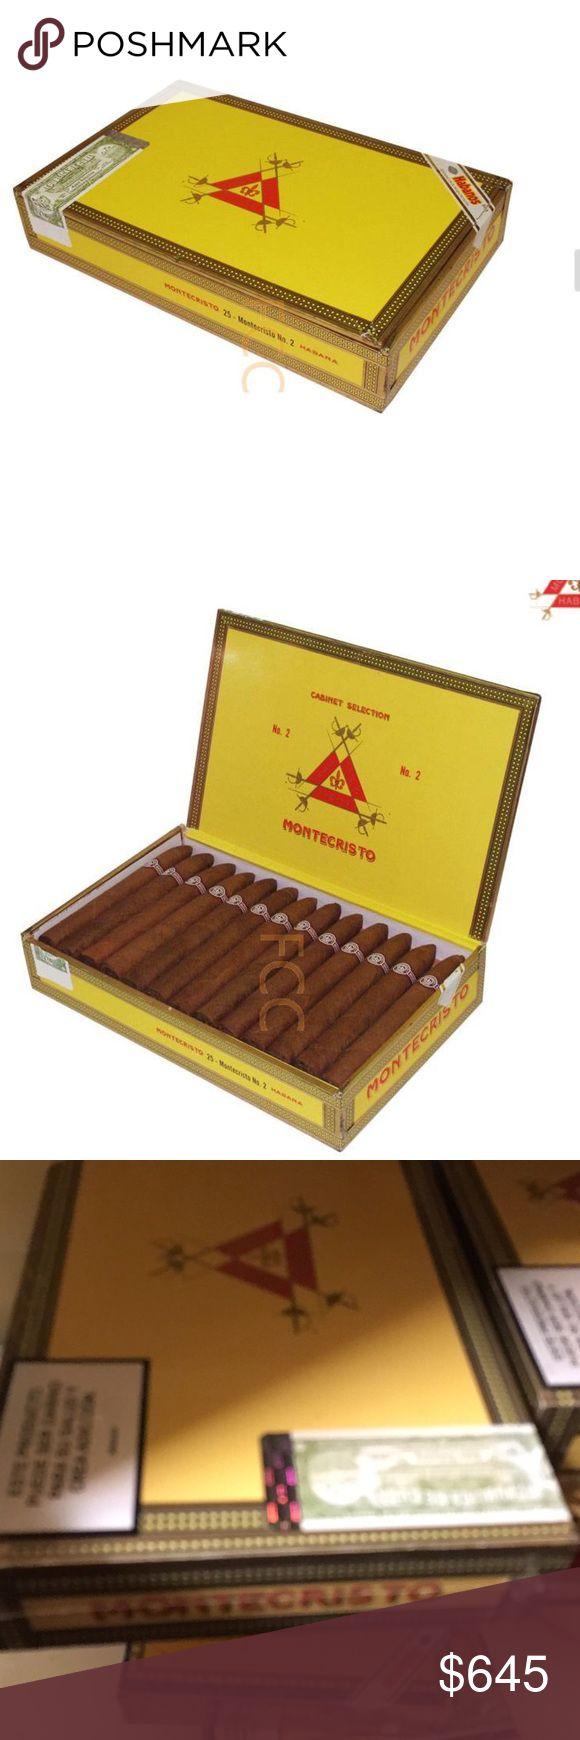 Montecristo #2 Havana ~ Torpedo Sealed Box Legit 100 % Sealed Box of # 2's ~ Havana Montecristo Other